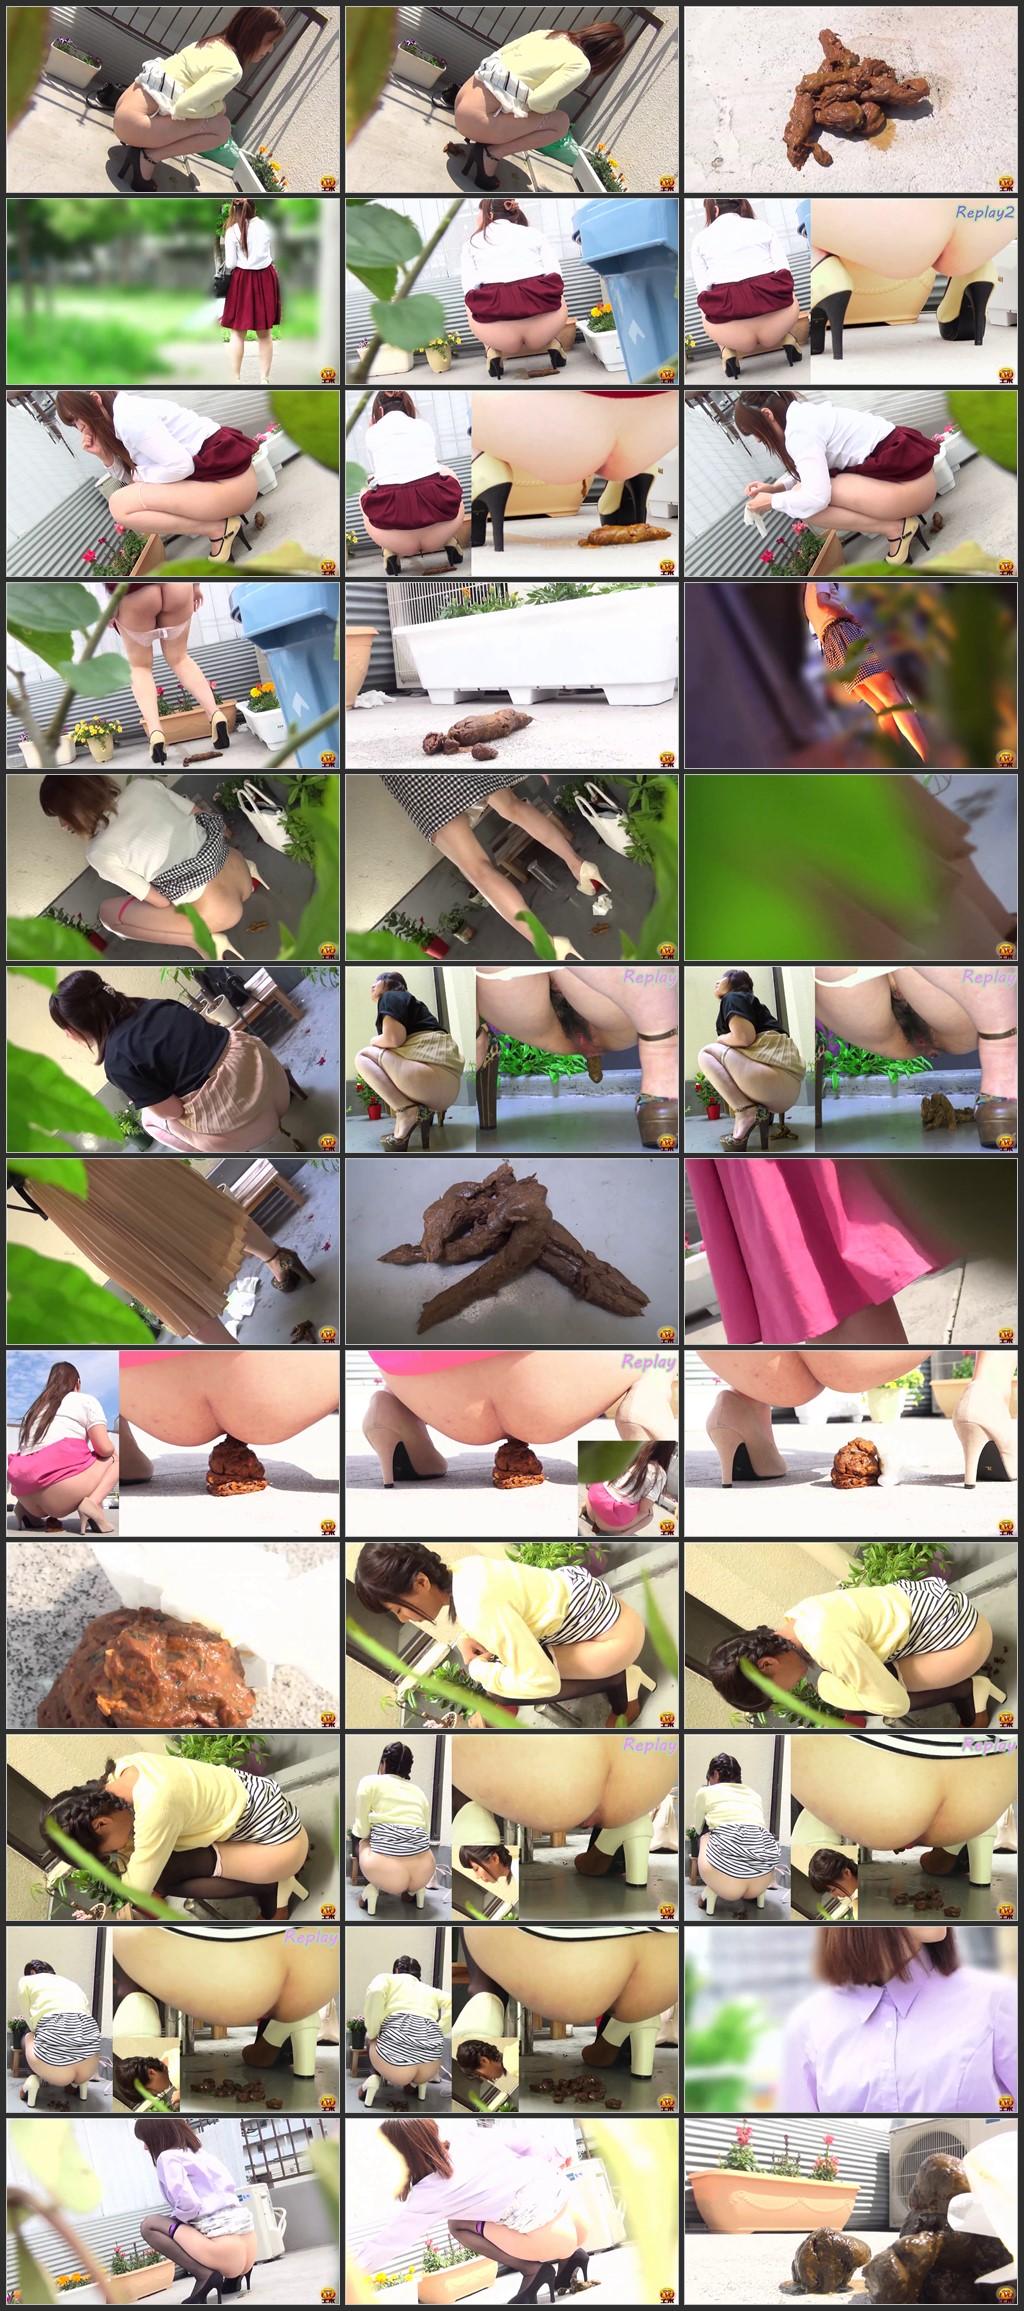 [EE-236] Spring peeping 美人野グソ Defecation Scat